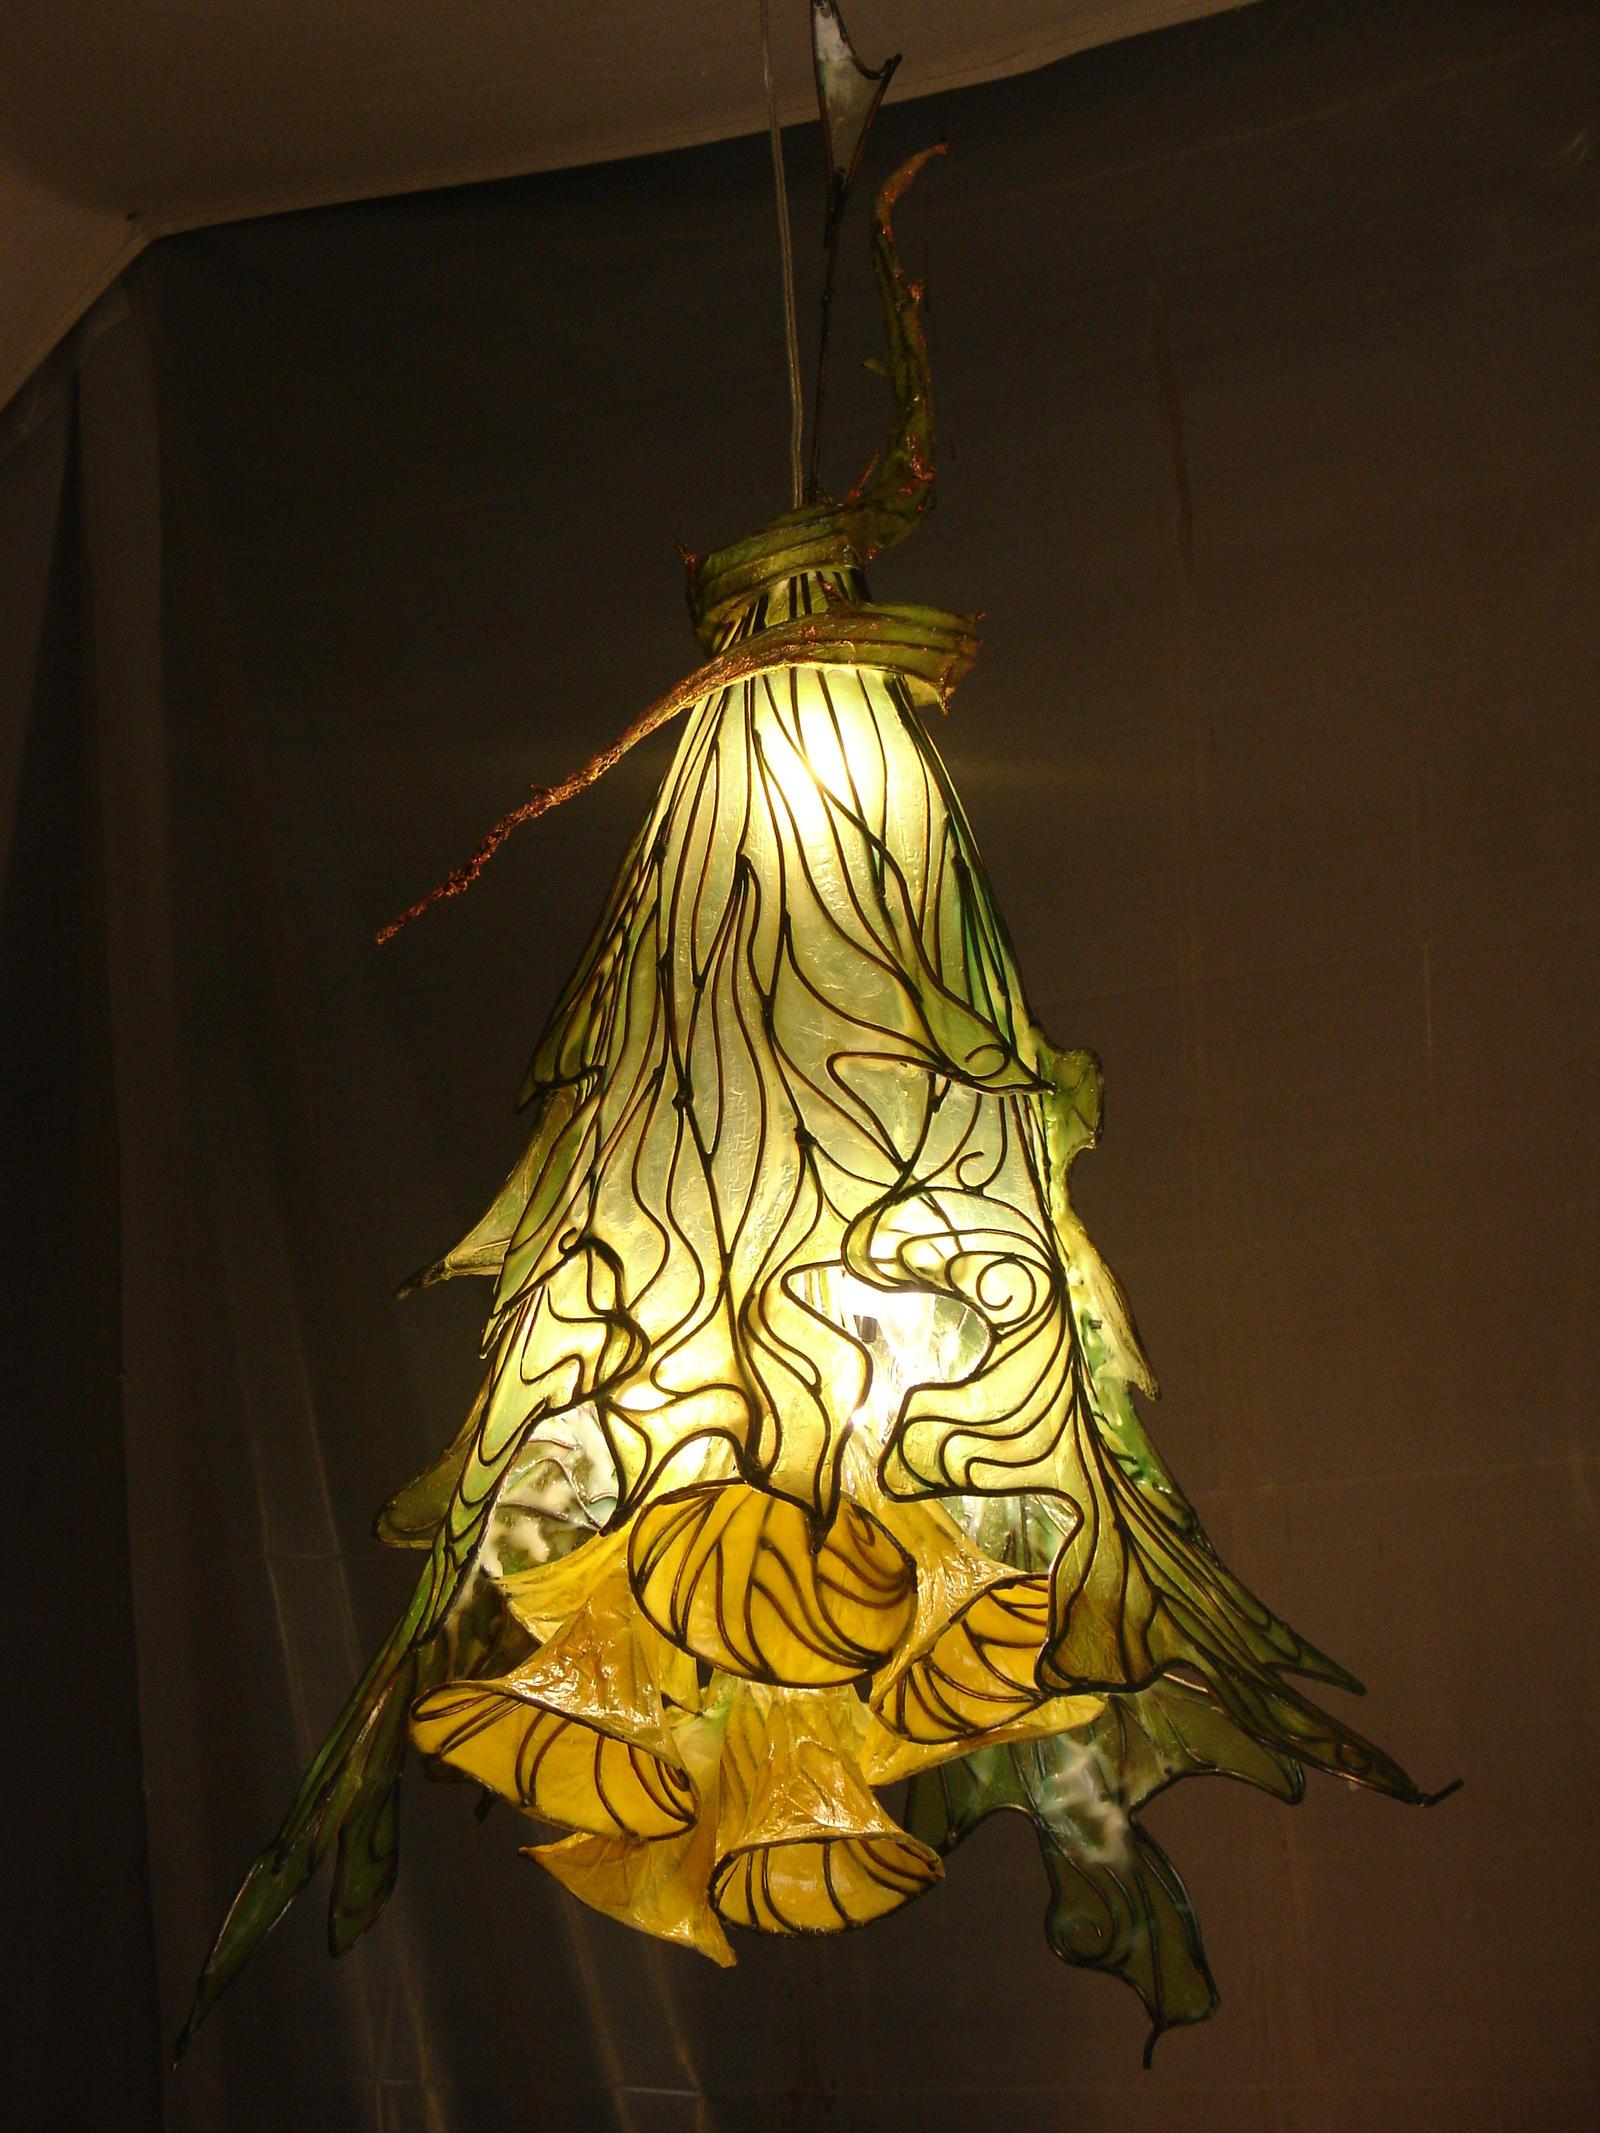 ... Flower Lamp   4 U0027K Lampu0027 By OkapiZen